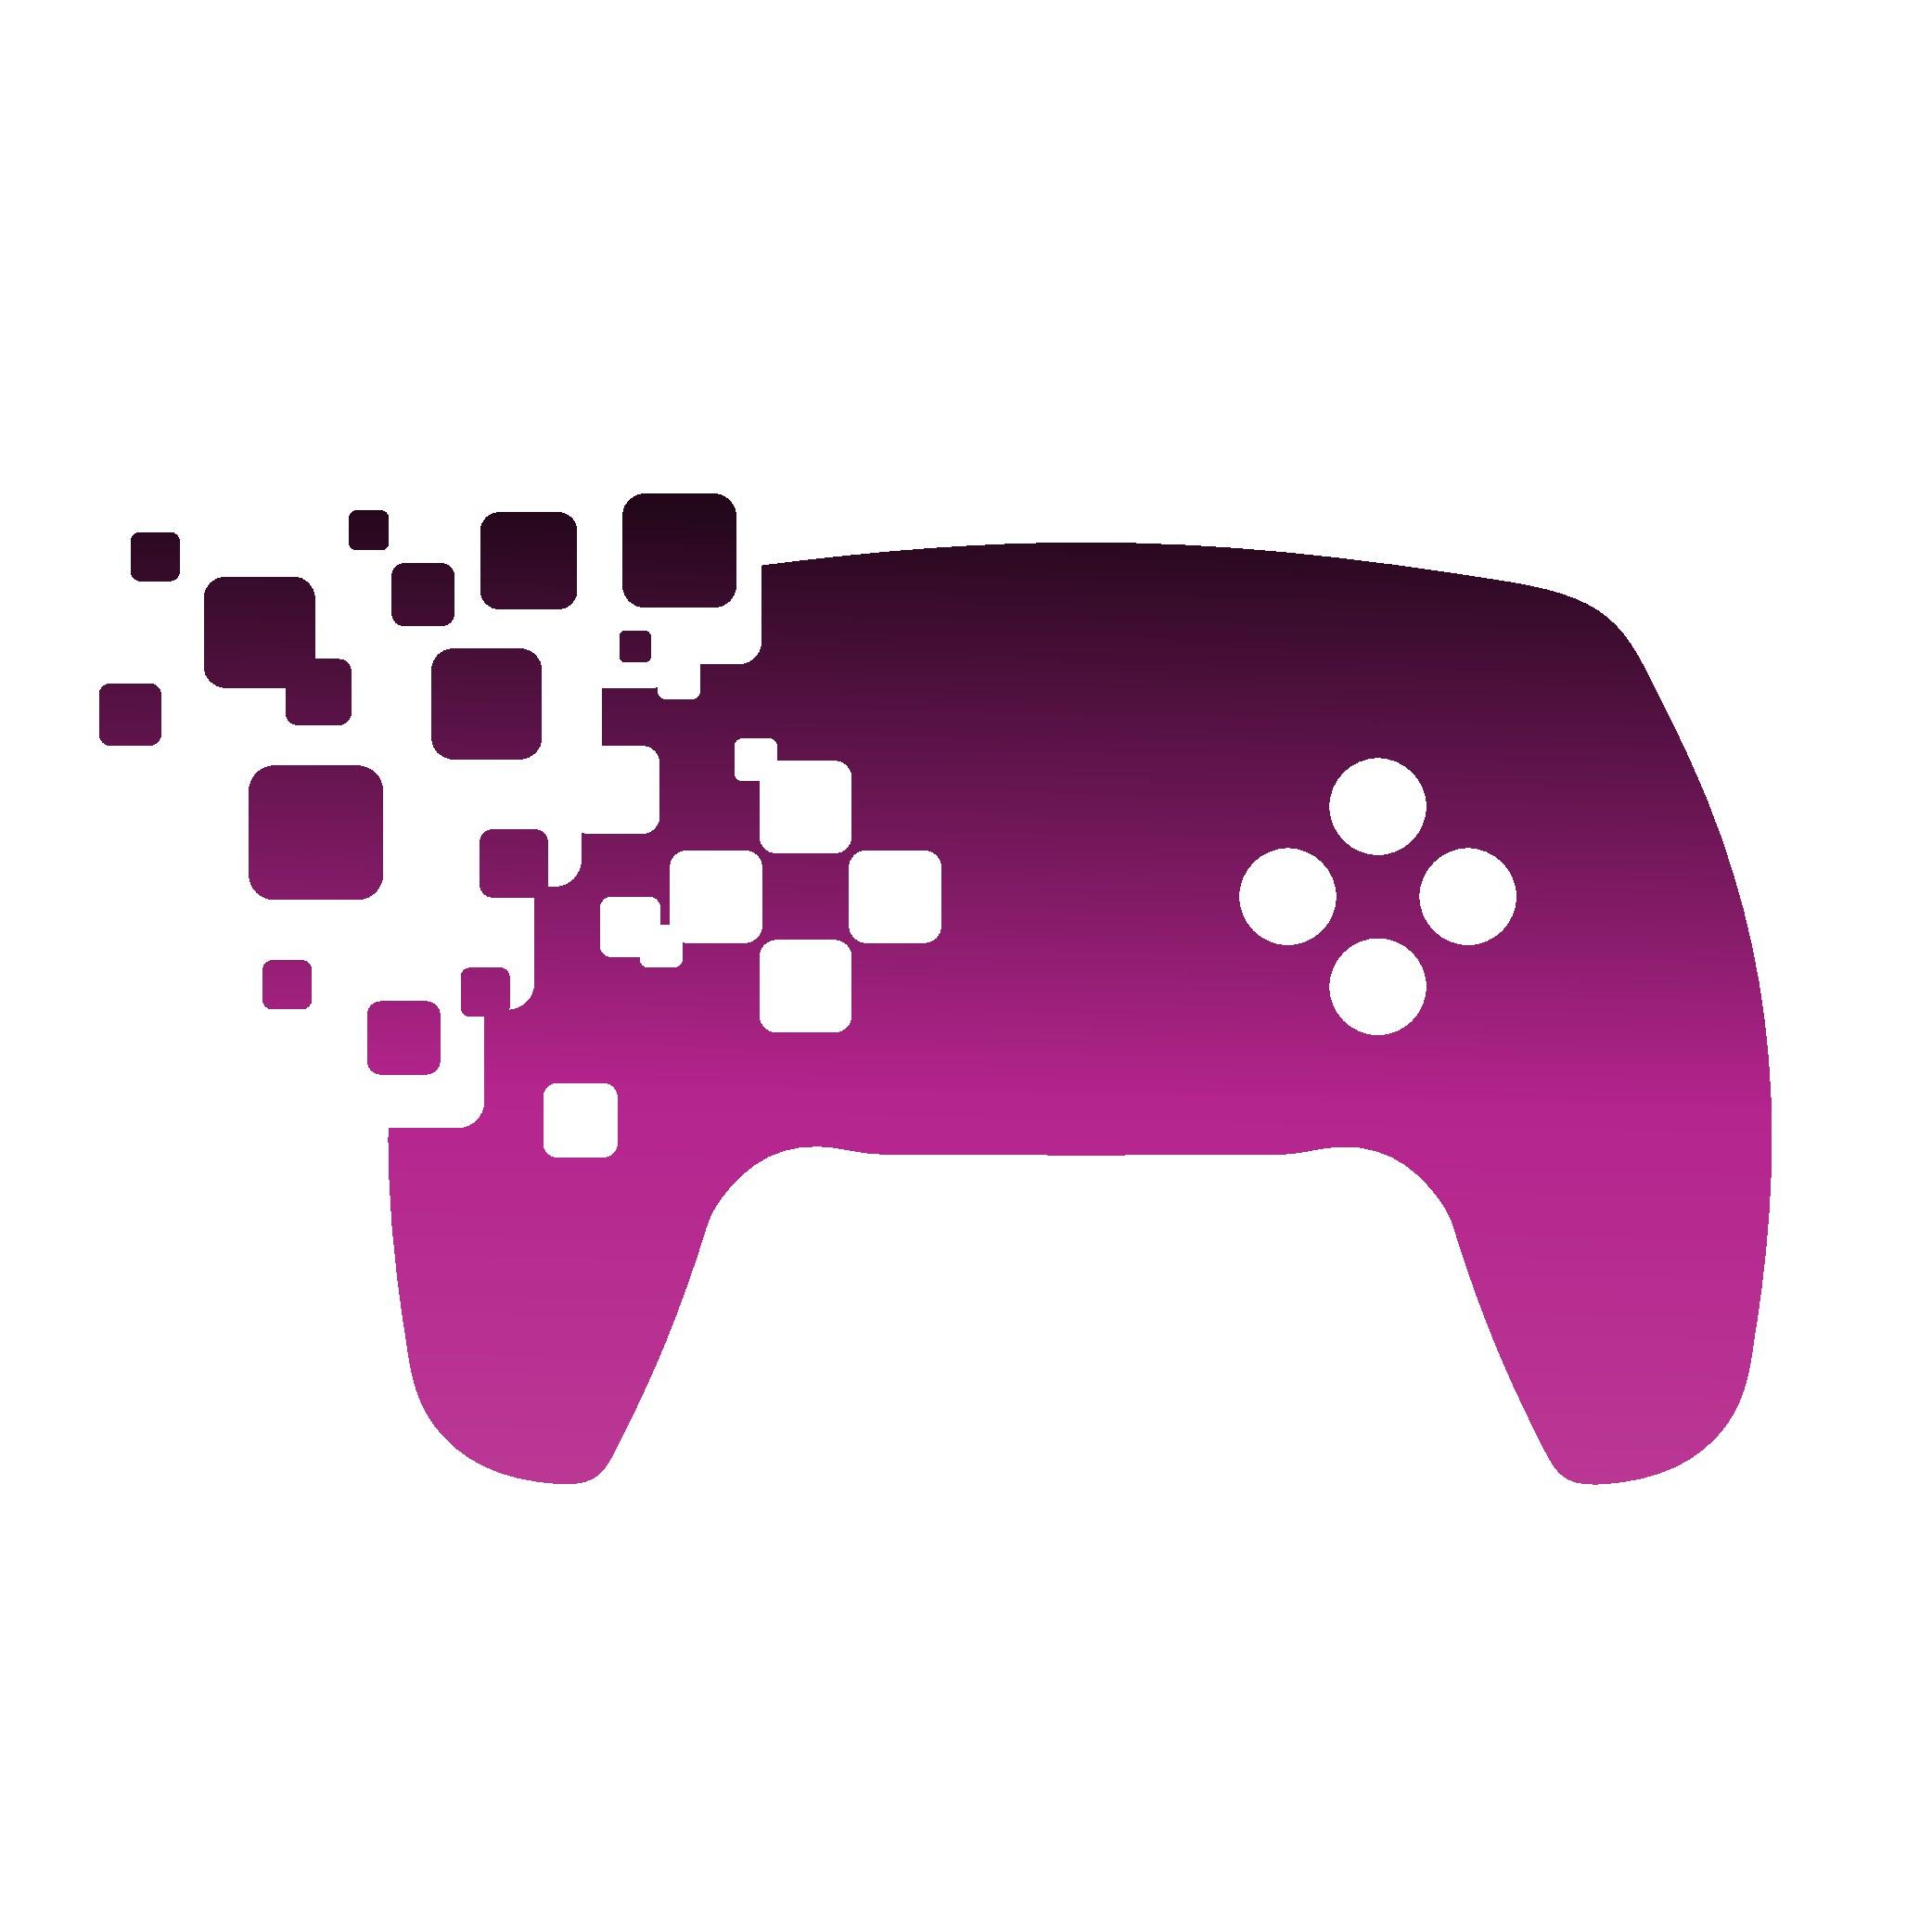 Premier Gaming Blog & Podcast needs a new Logo